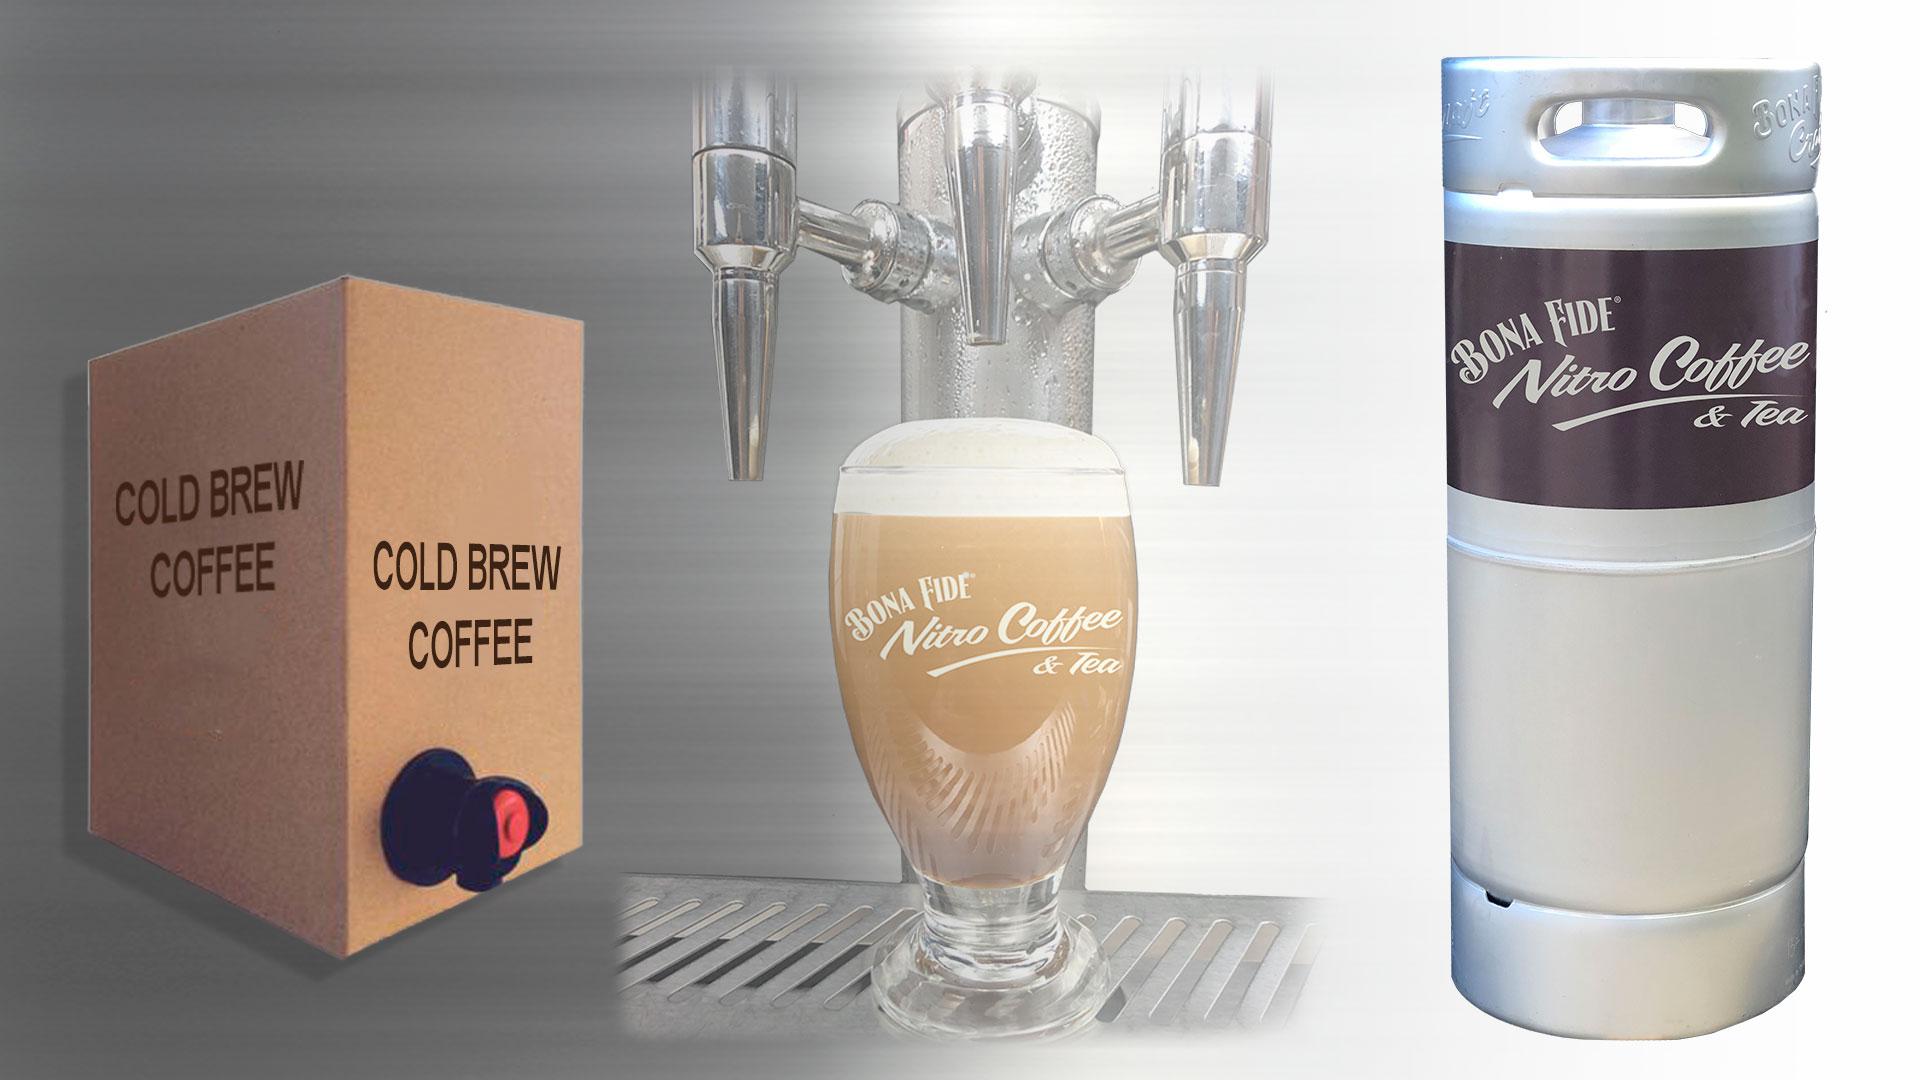 Cold Brew Coffee Concentrate Bag In Box Versus Cold Brew In Kegs Bona Fide Nitro Coffee and Tea